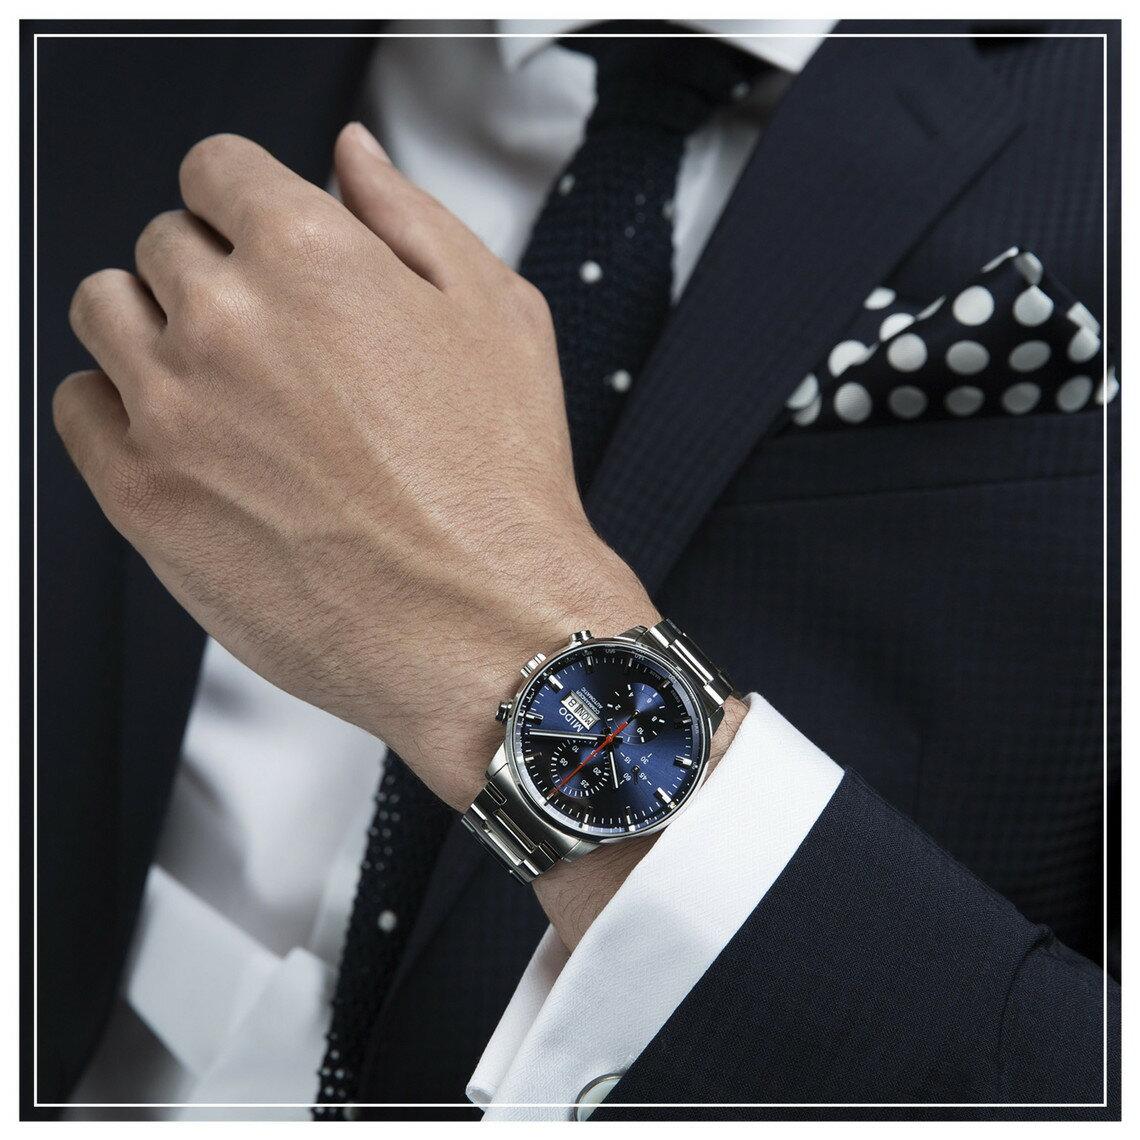 MIDO 美度 M0164141104100 Commander 指揮官系列機械腕錶 藍 銀 42.5mm 4